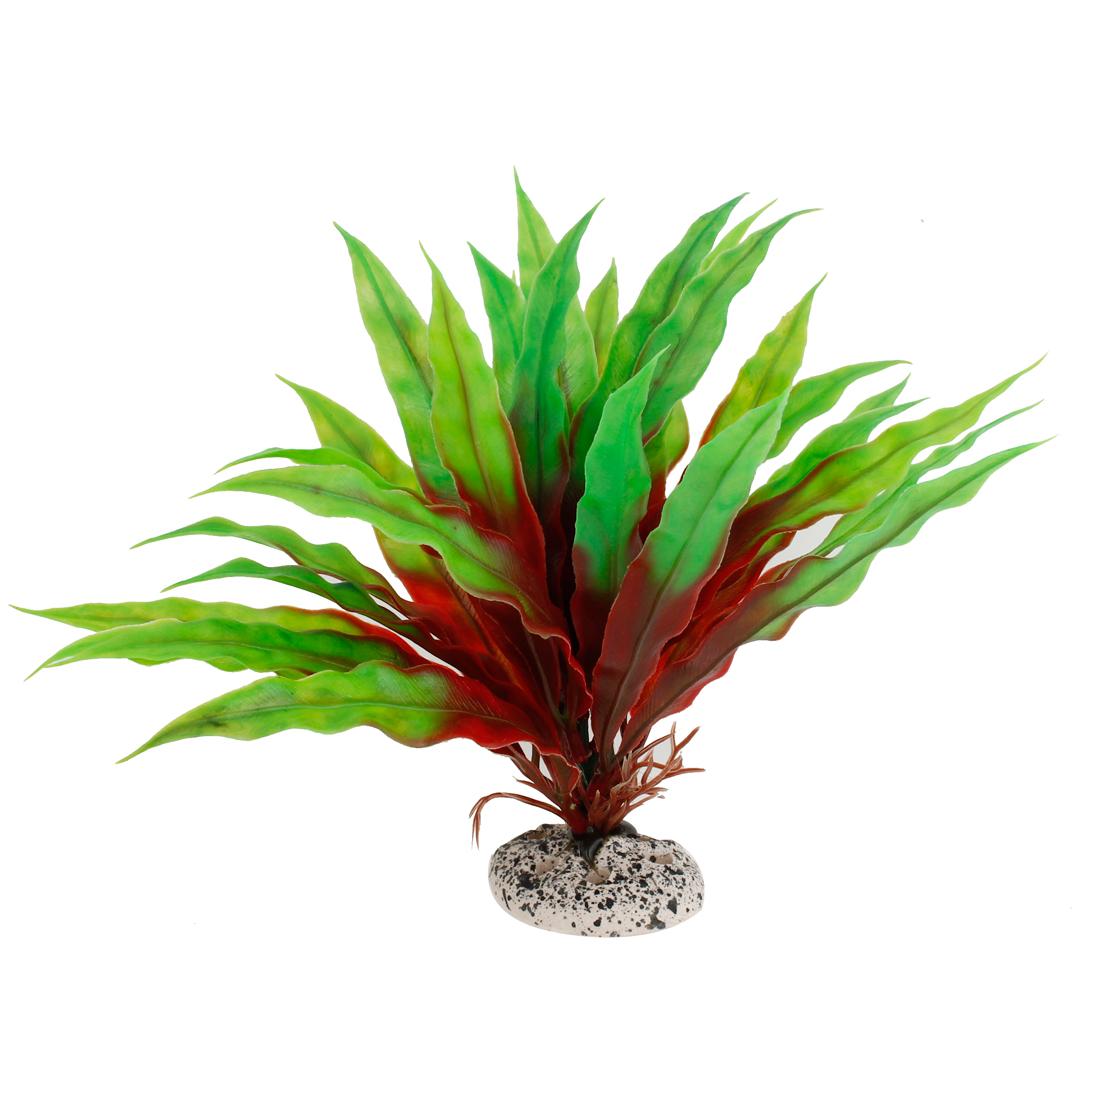 "Fish Tank Aquarium Decorative Emulational Plastic Plant Green Red 7.5"" Height"